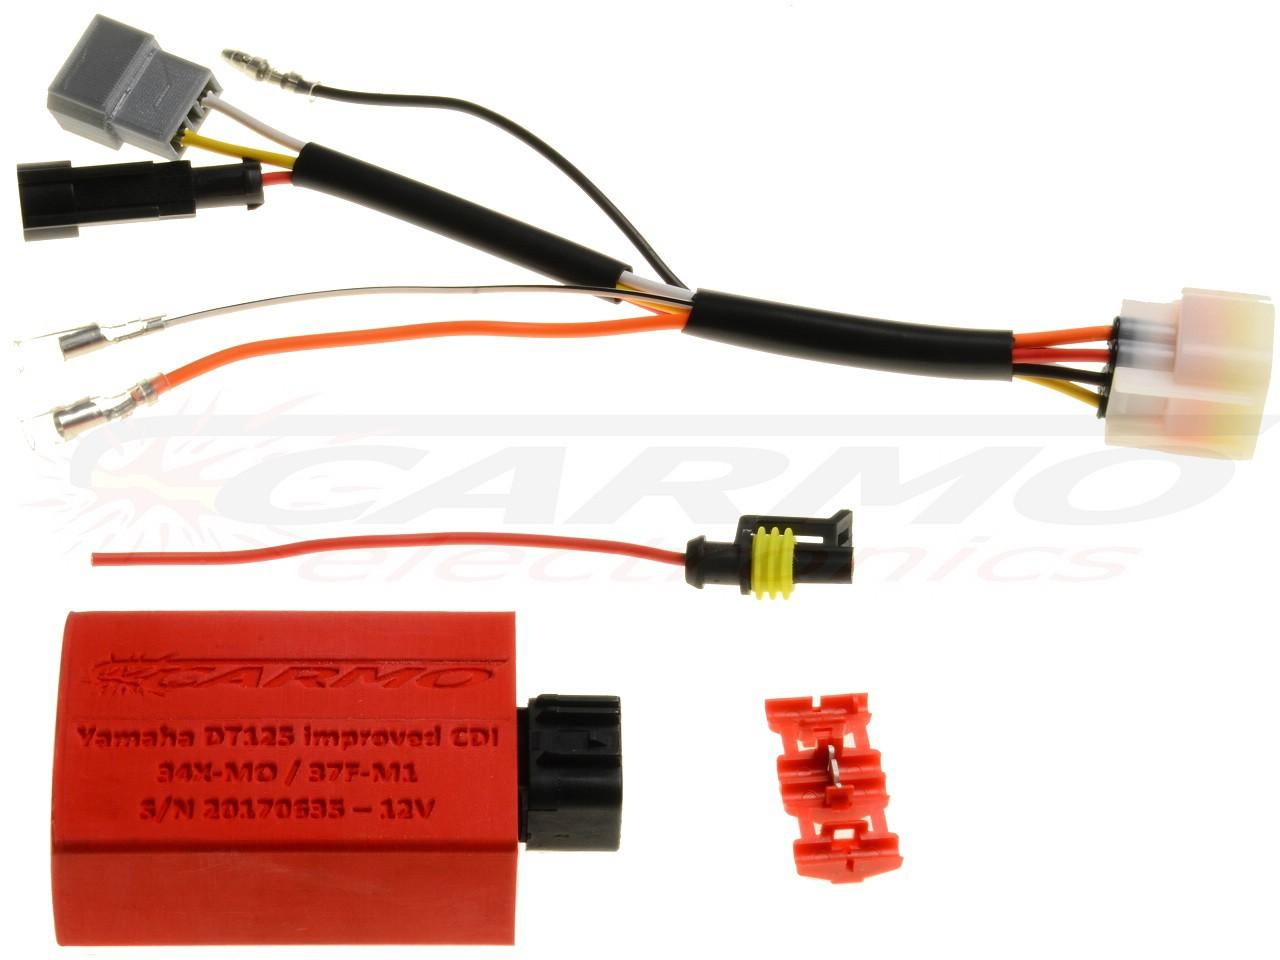 Yamaha Dt 125 Cdi Box Wiring - Wiring Diagram Schematic on